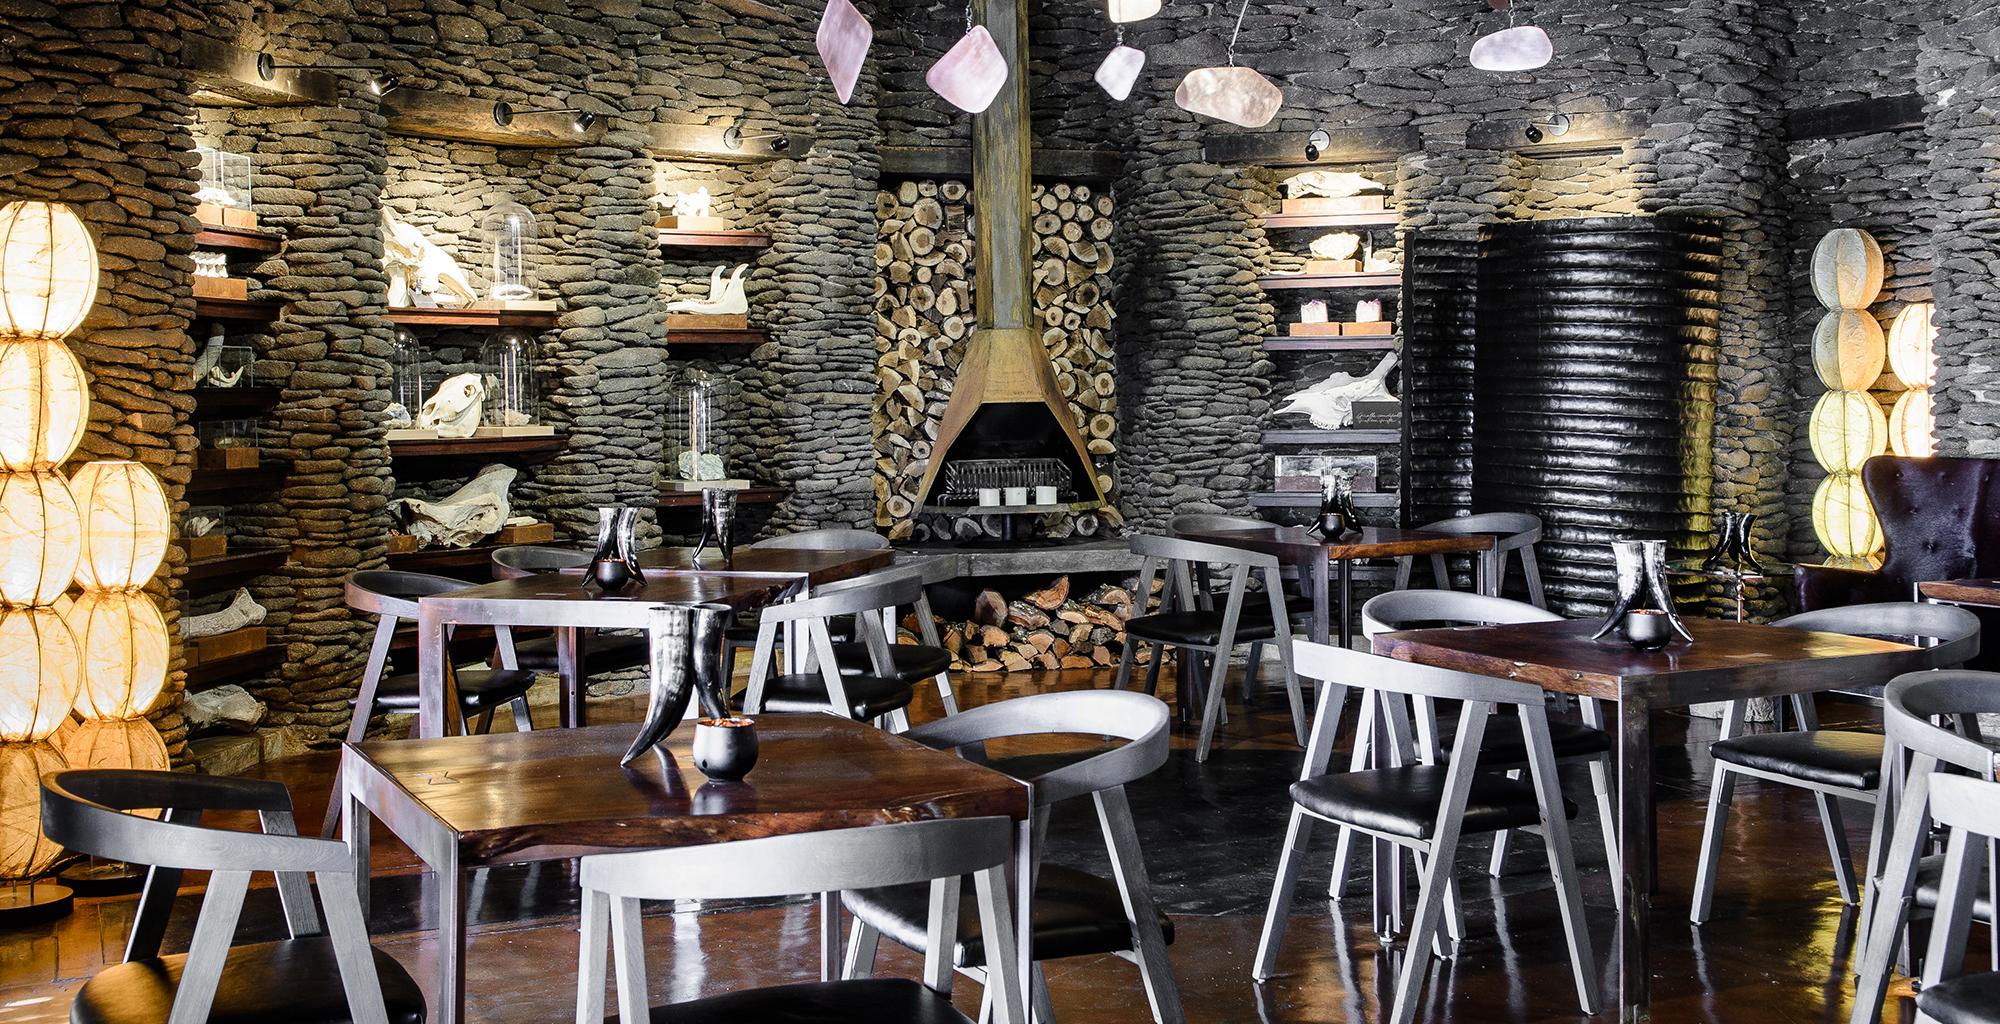 South-Africa-Singita-Boulders-Dining